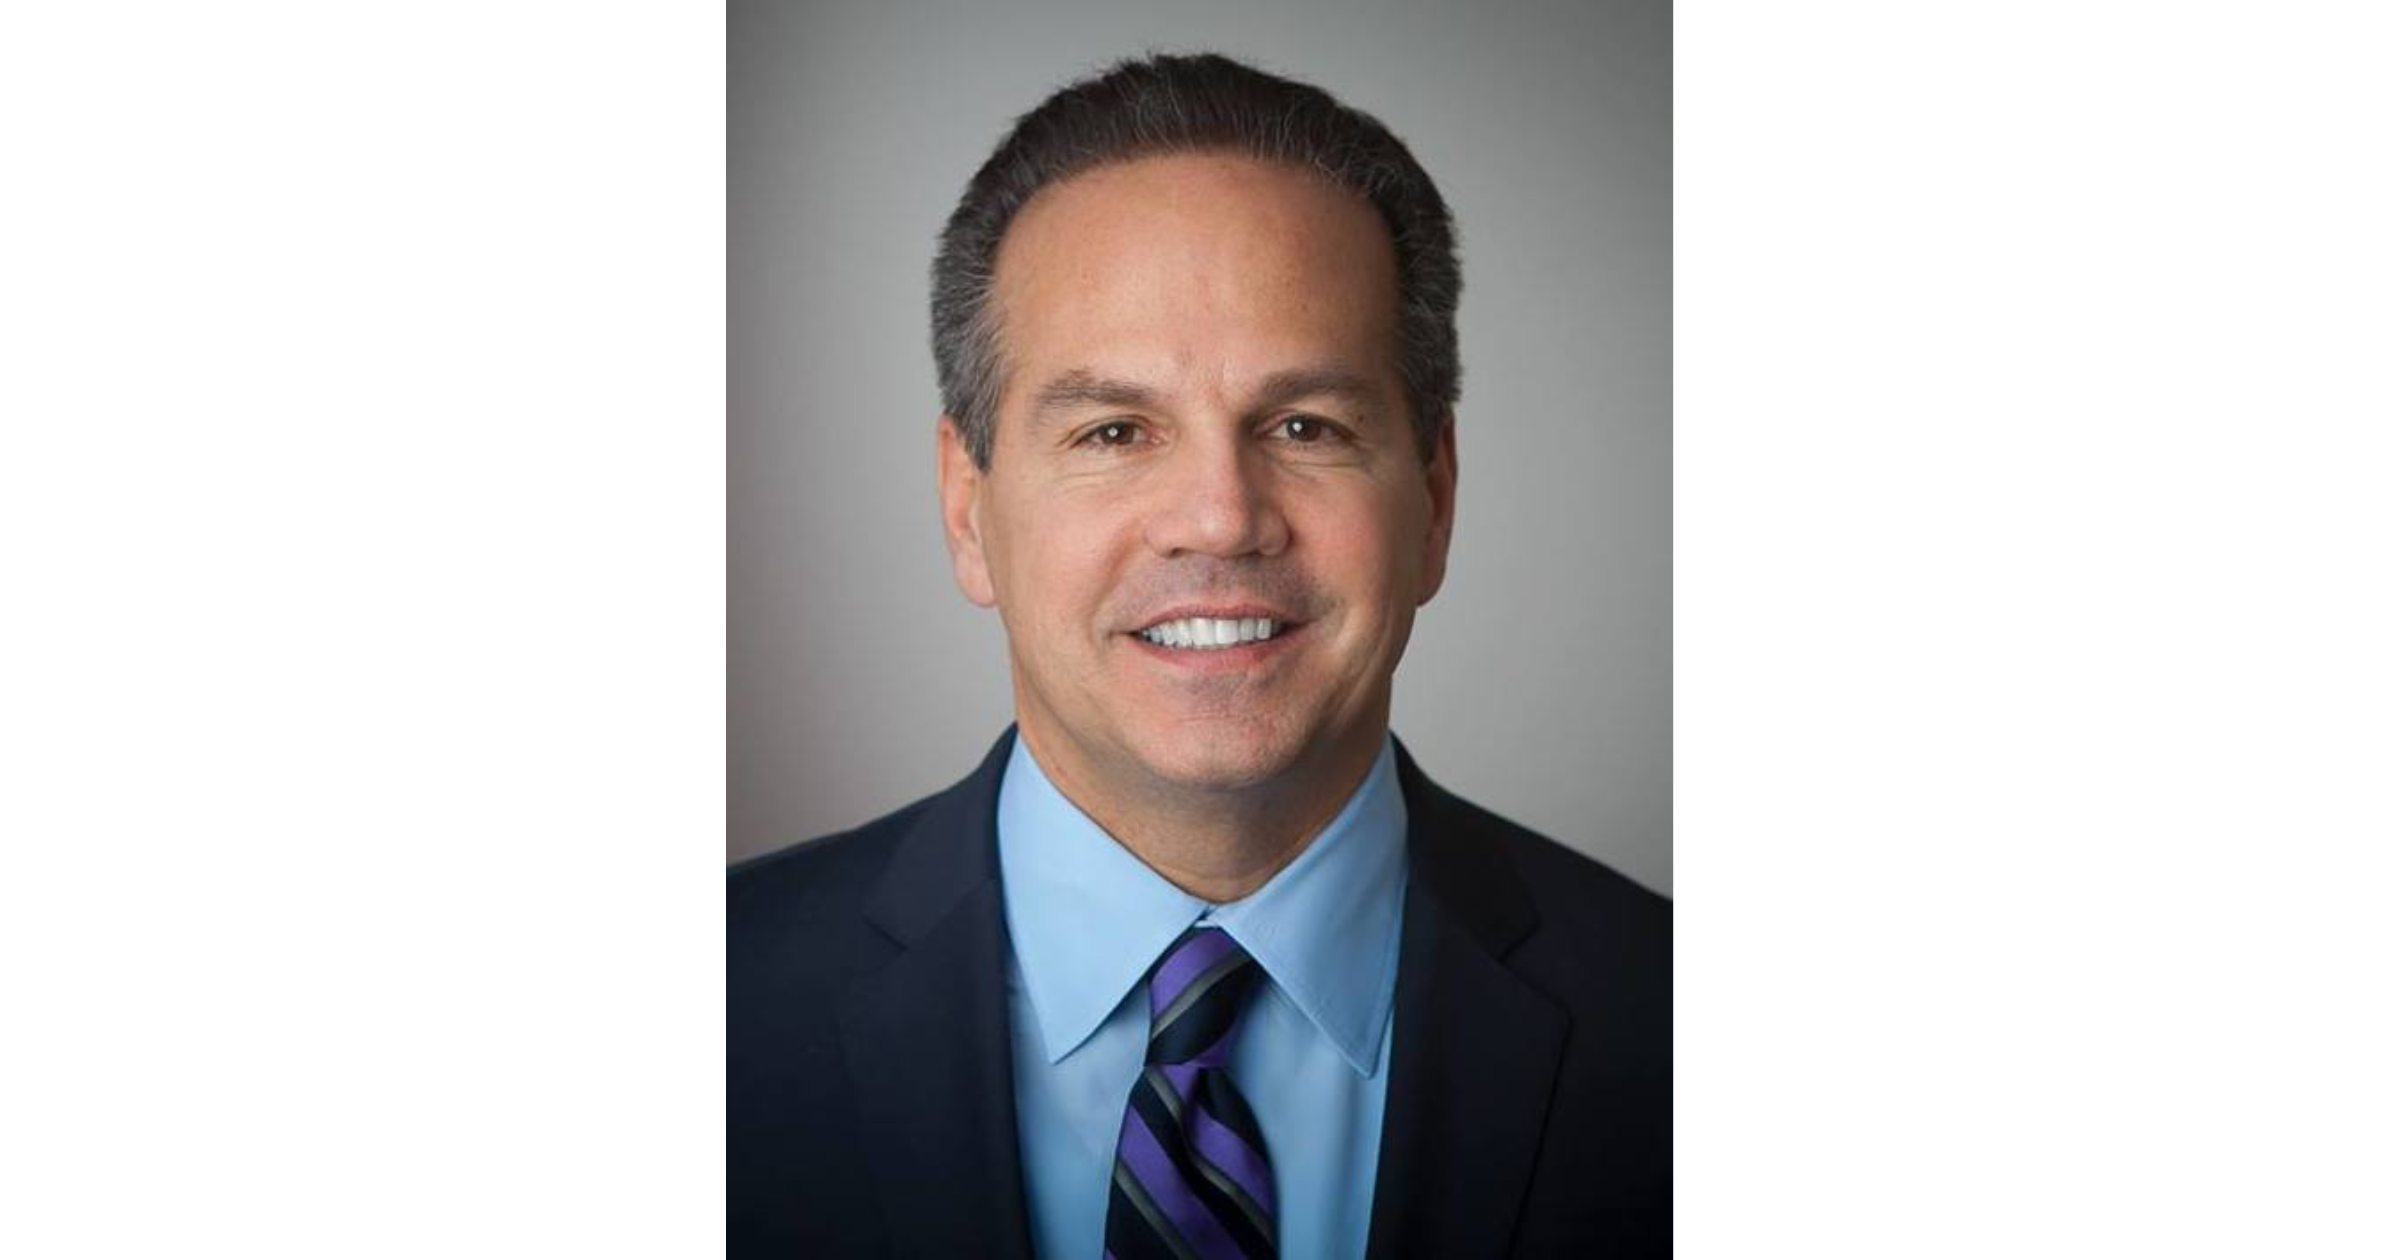 Representative David Cicilline